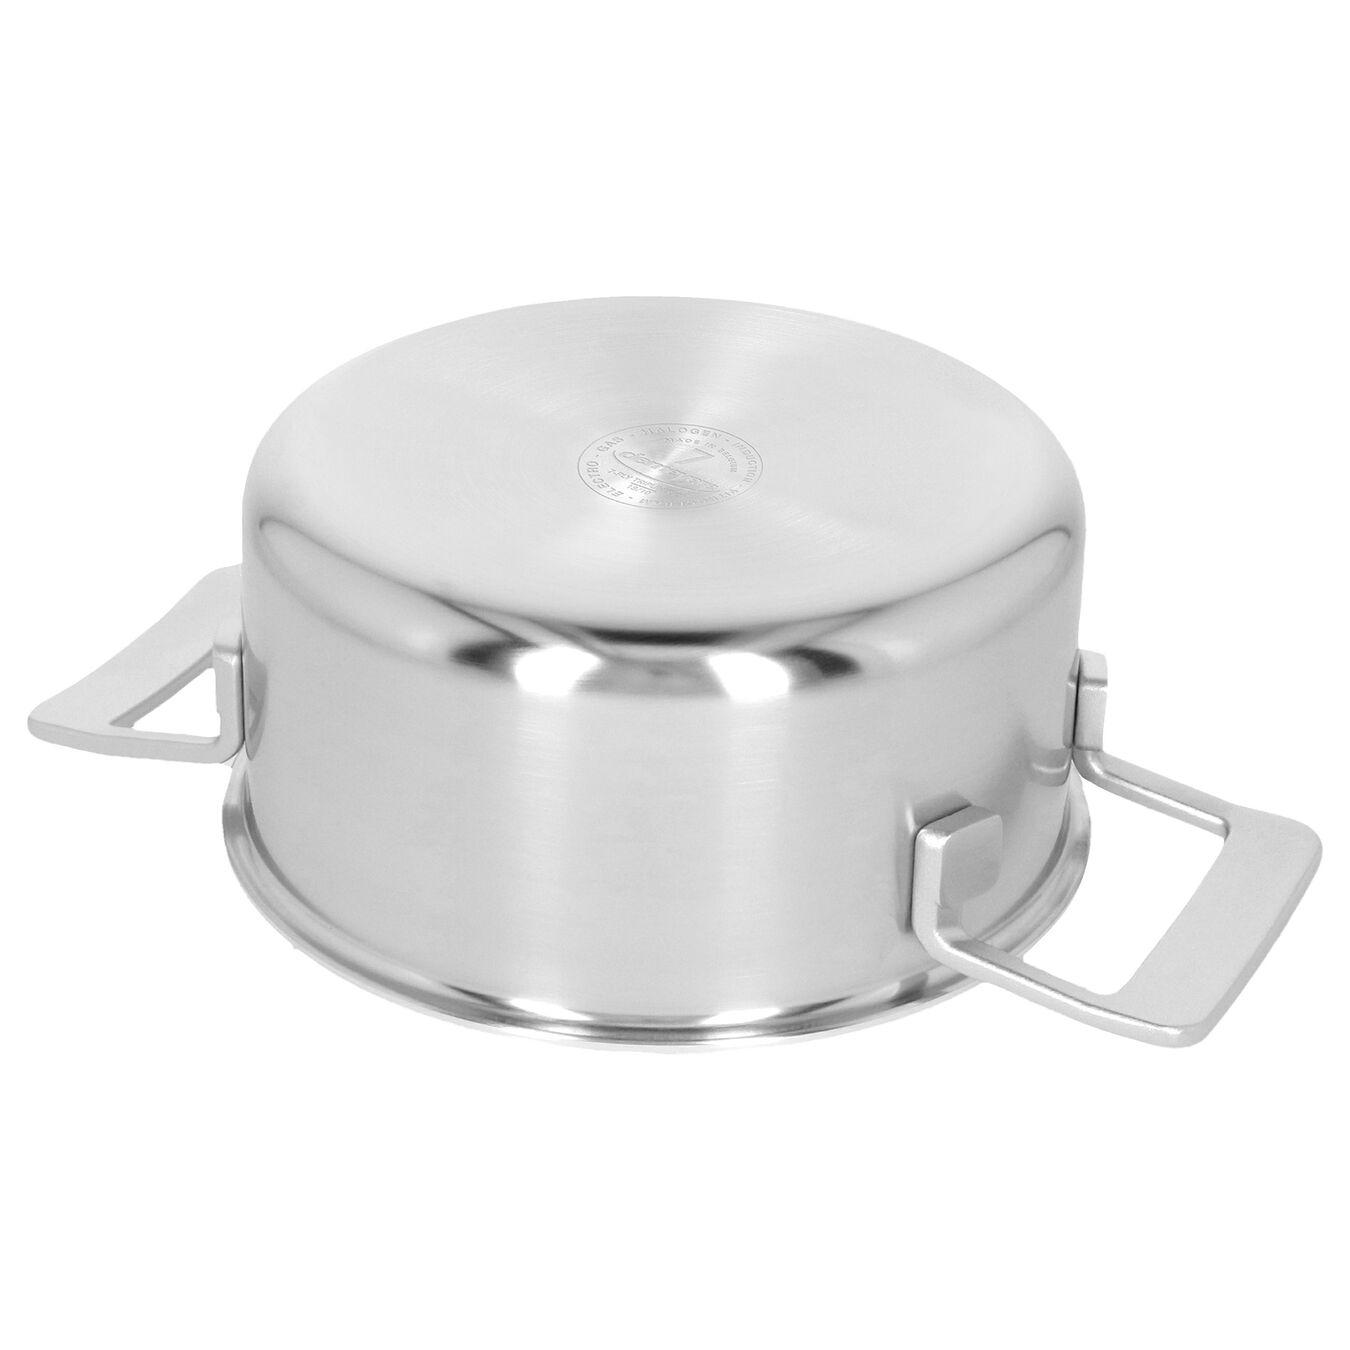 Kookpot met deksel 18 cm / 2,25 l,,large 4